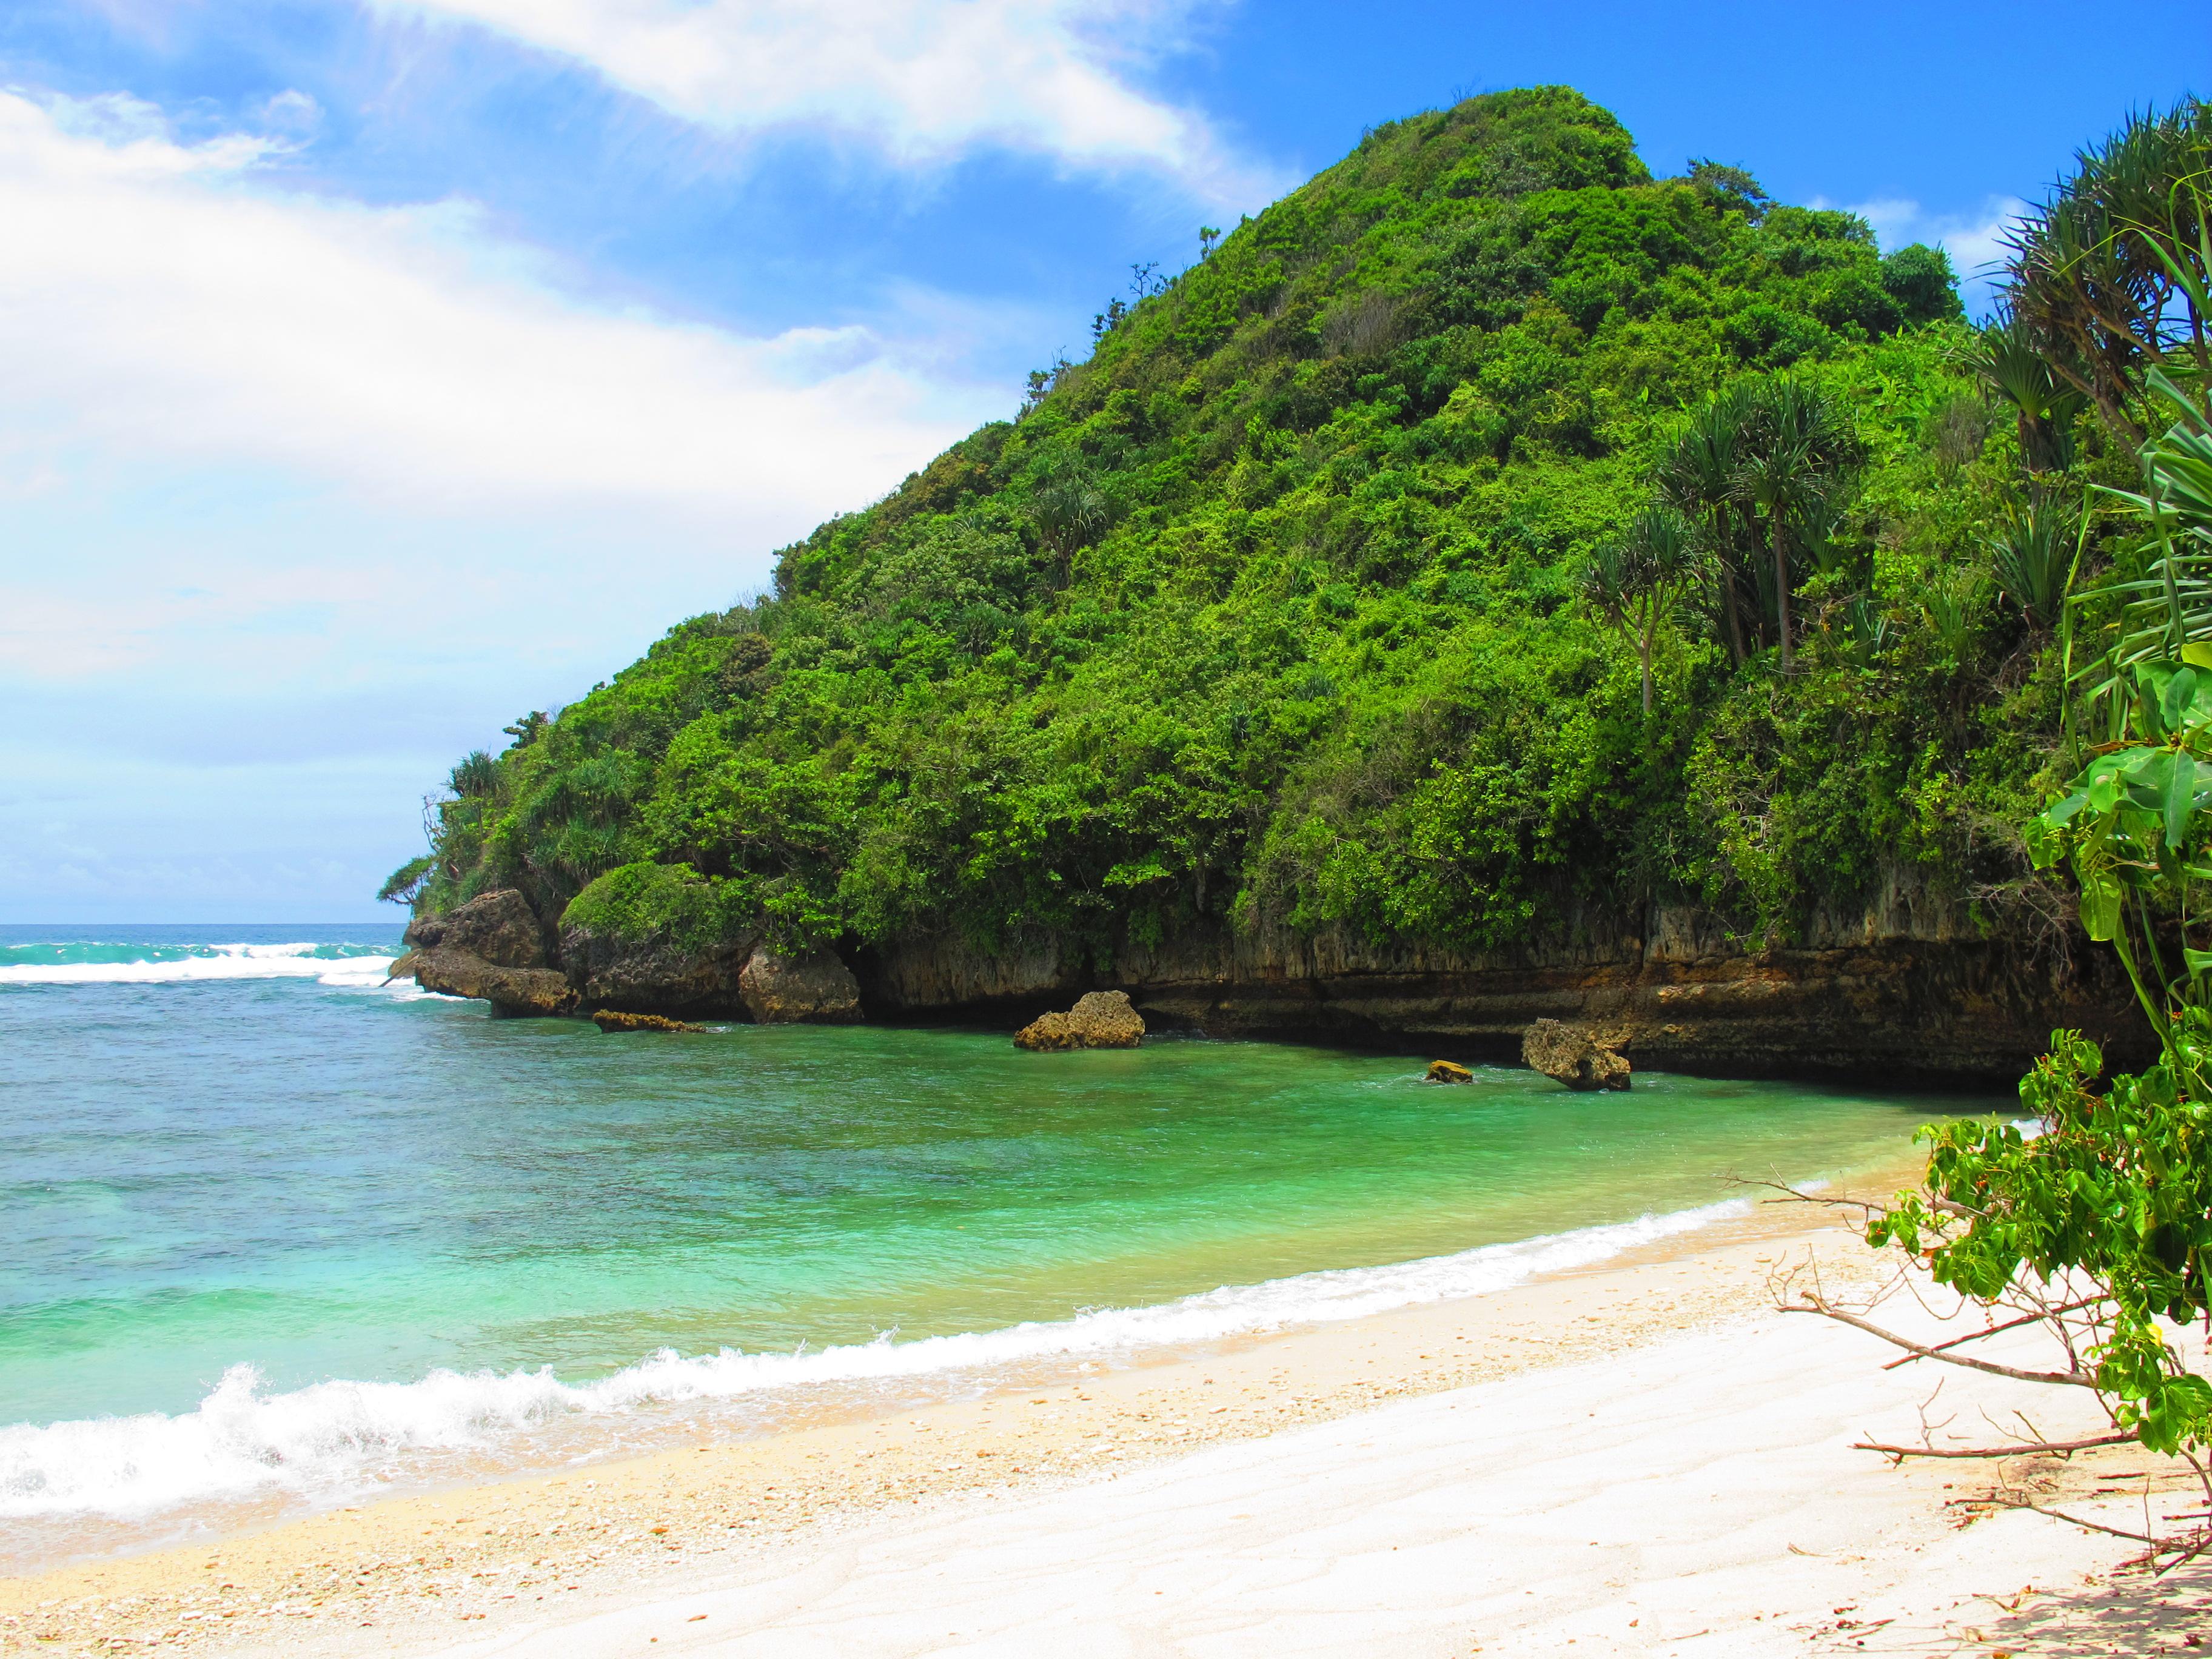 Clungup And Goa Cina Malang Beaches Photo Essay